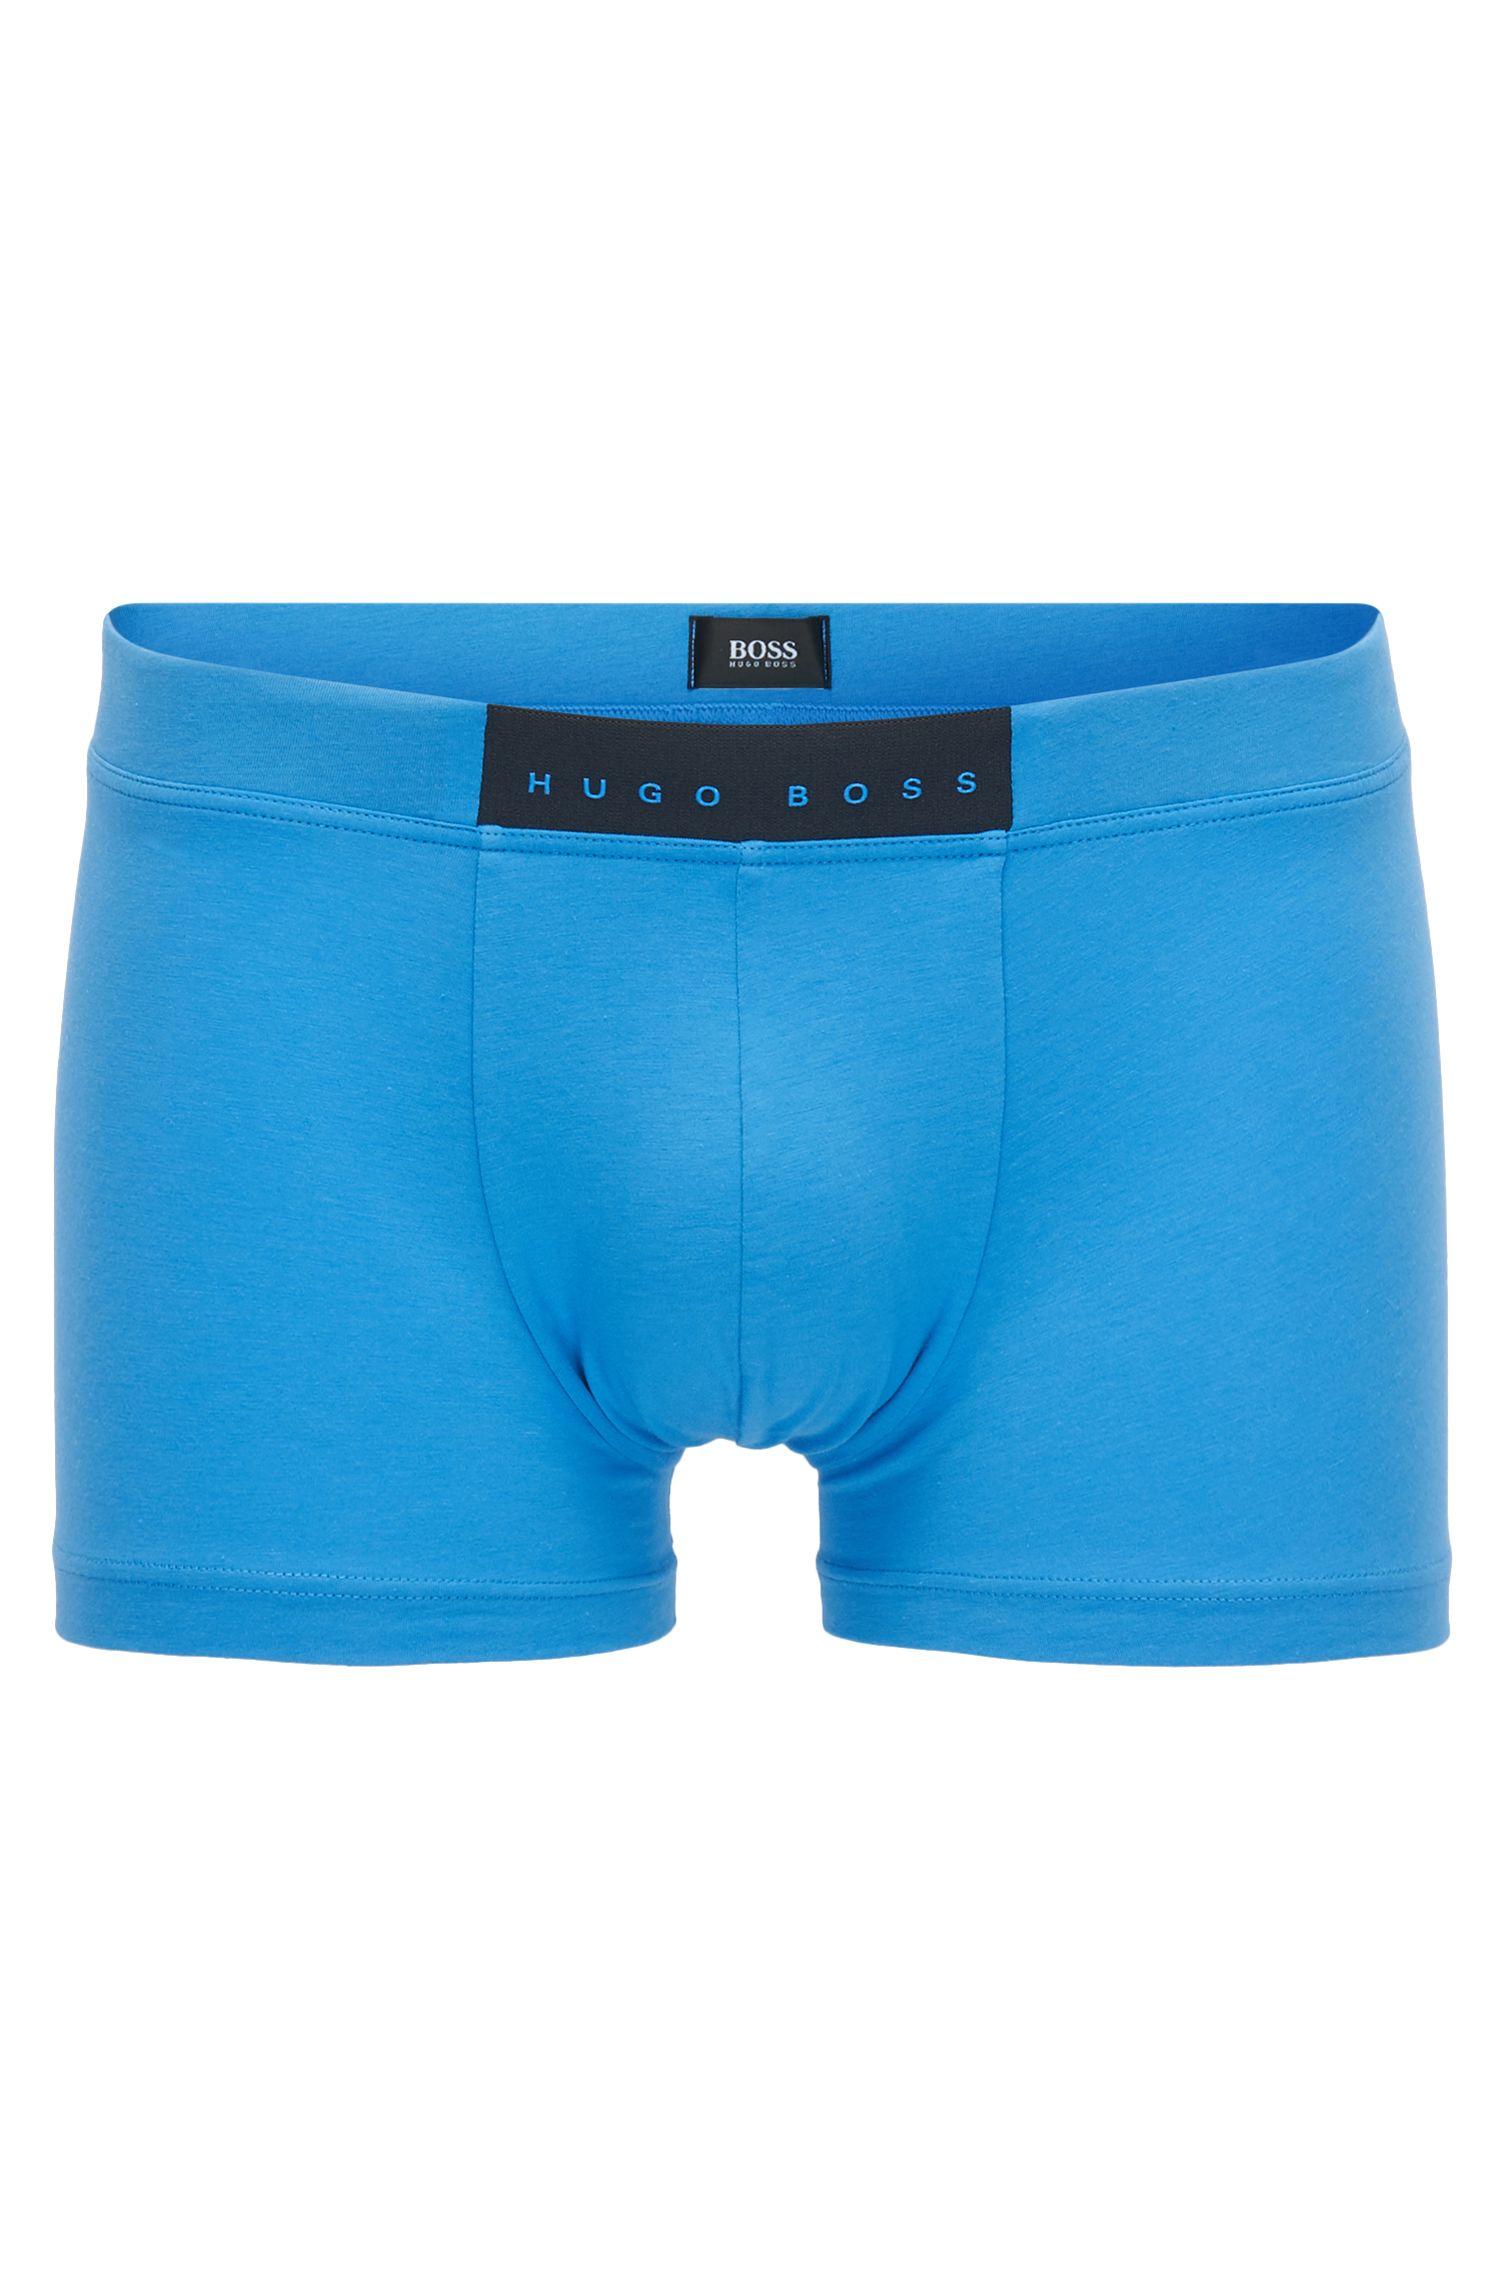 Stretch Cotton Trunk | Trunk Comfort, Blue